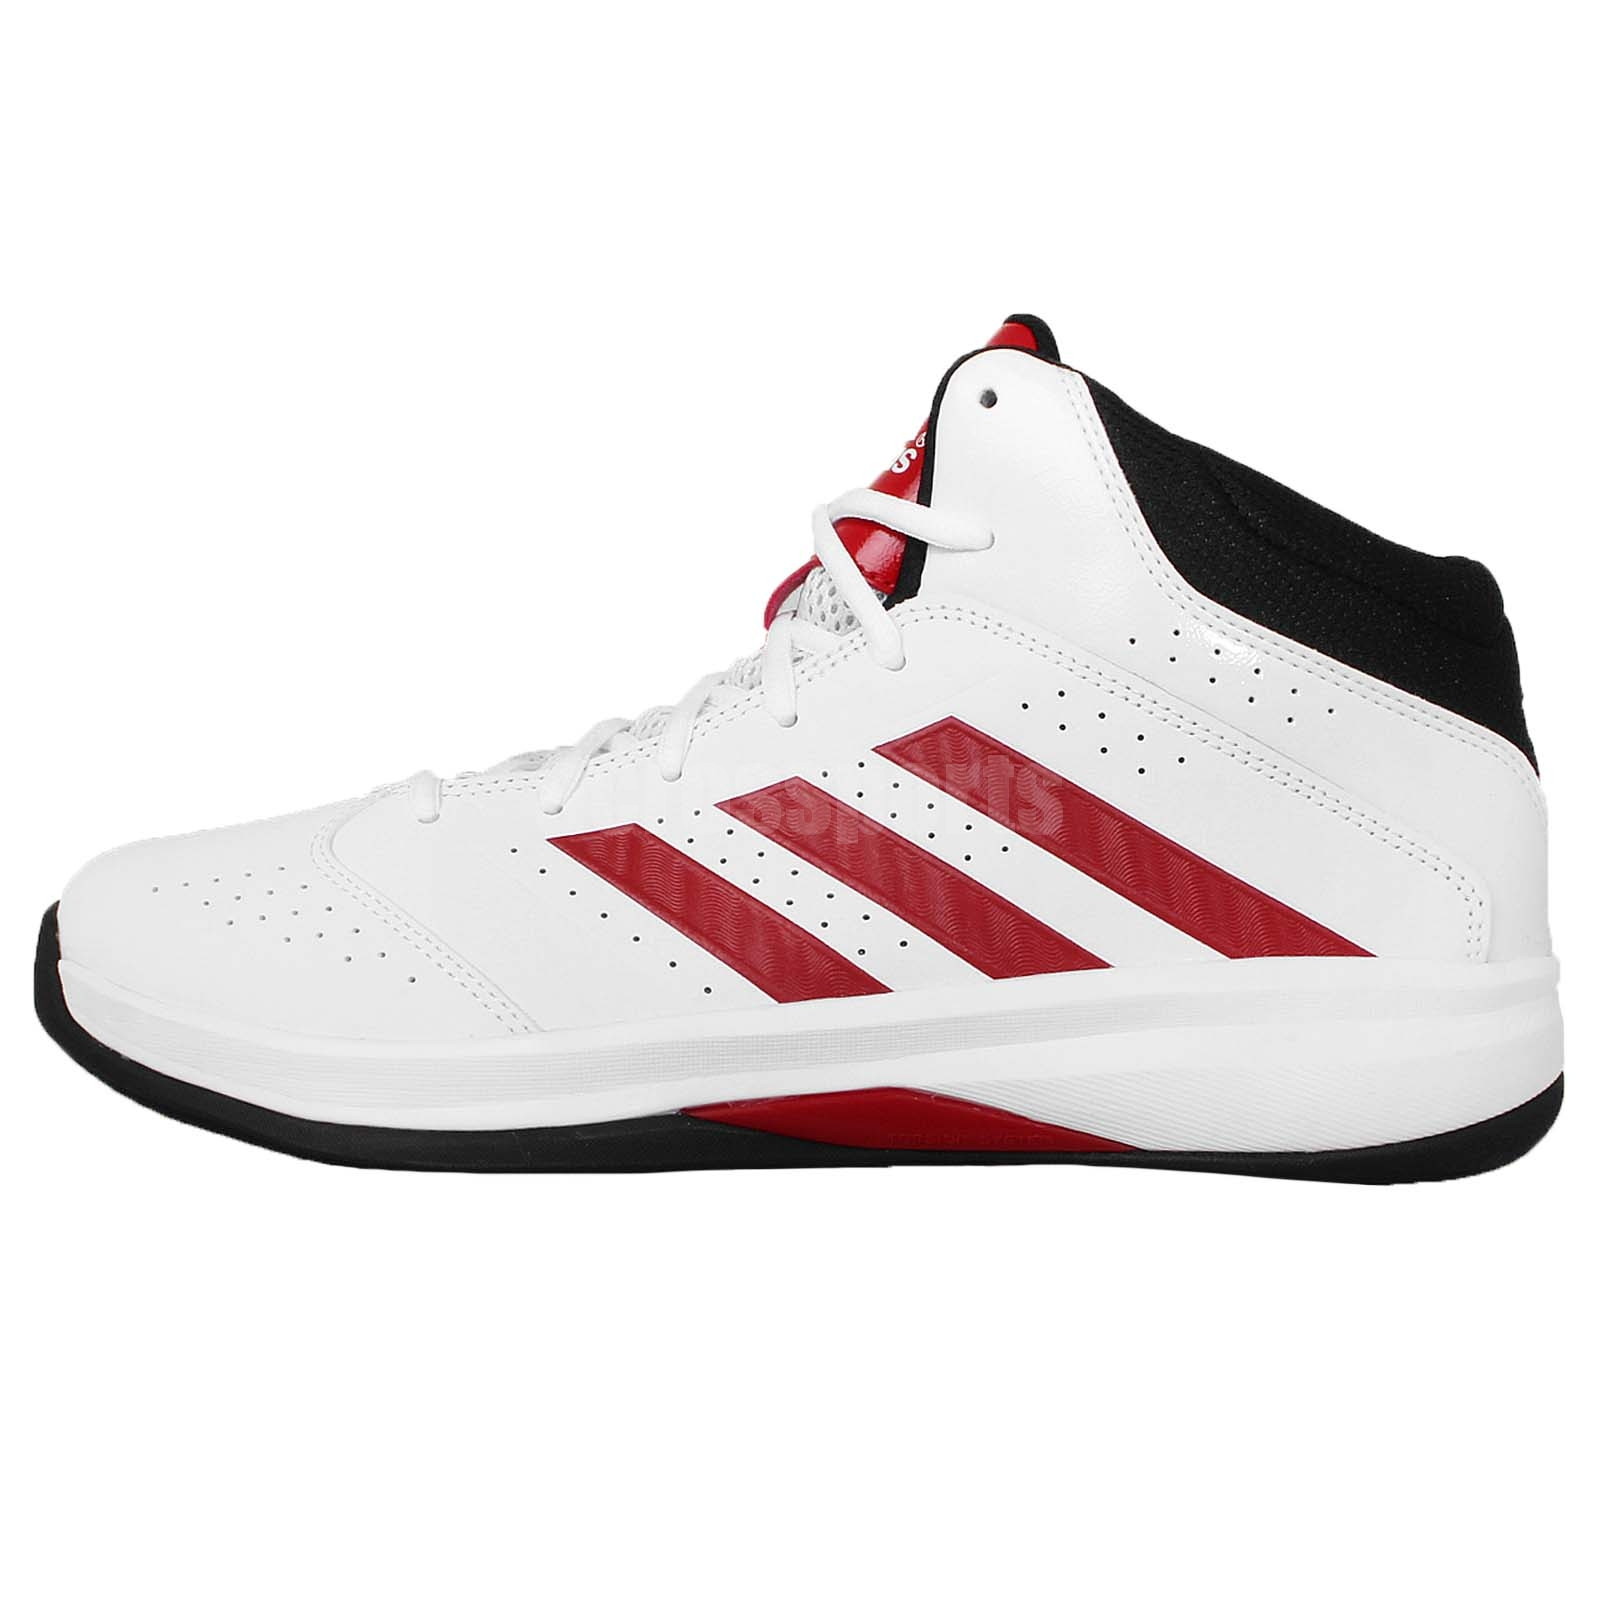 adidas isolation 2 white black red 2015 mens basketball. Black Bedroom Furniture Sets. Home Design Ideas